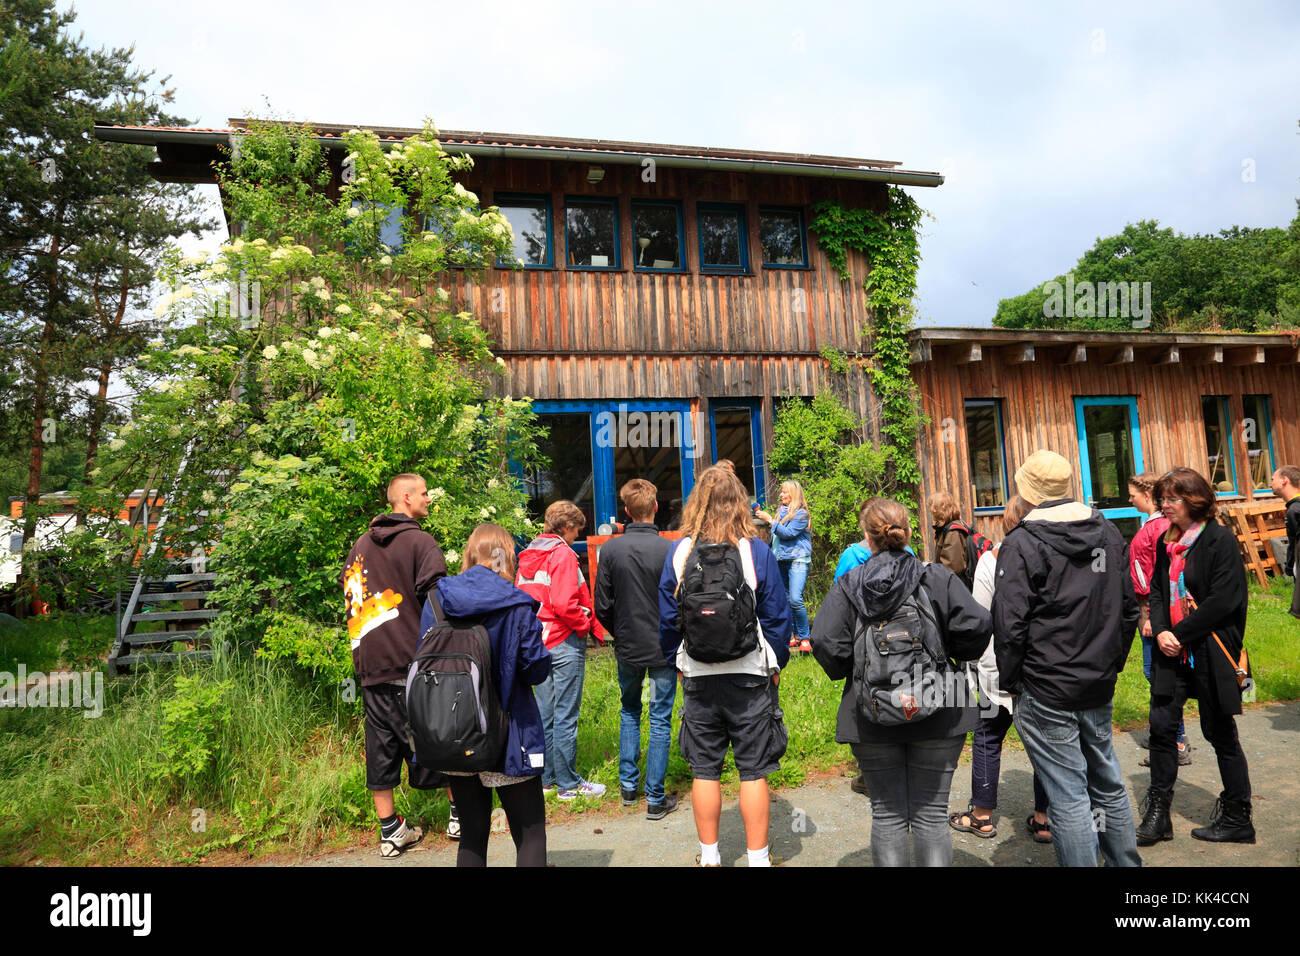 Guided tour through Ecovillage Sieben Linden near Beetzendorf / Salzwedel, Saxony-Anhalt, Germany, Europe - Stock Image